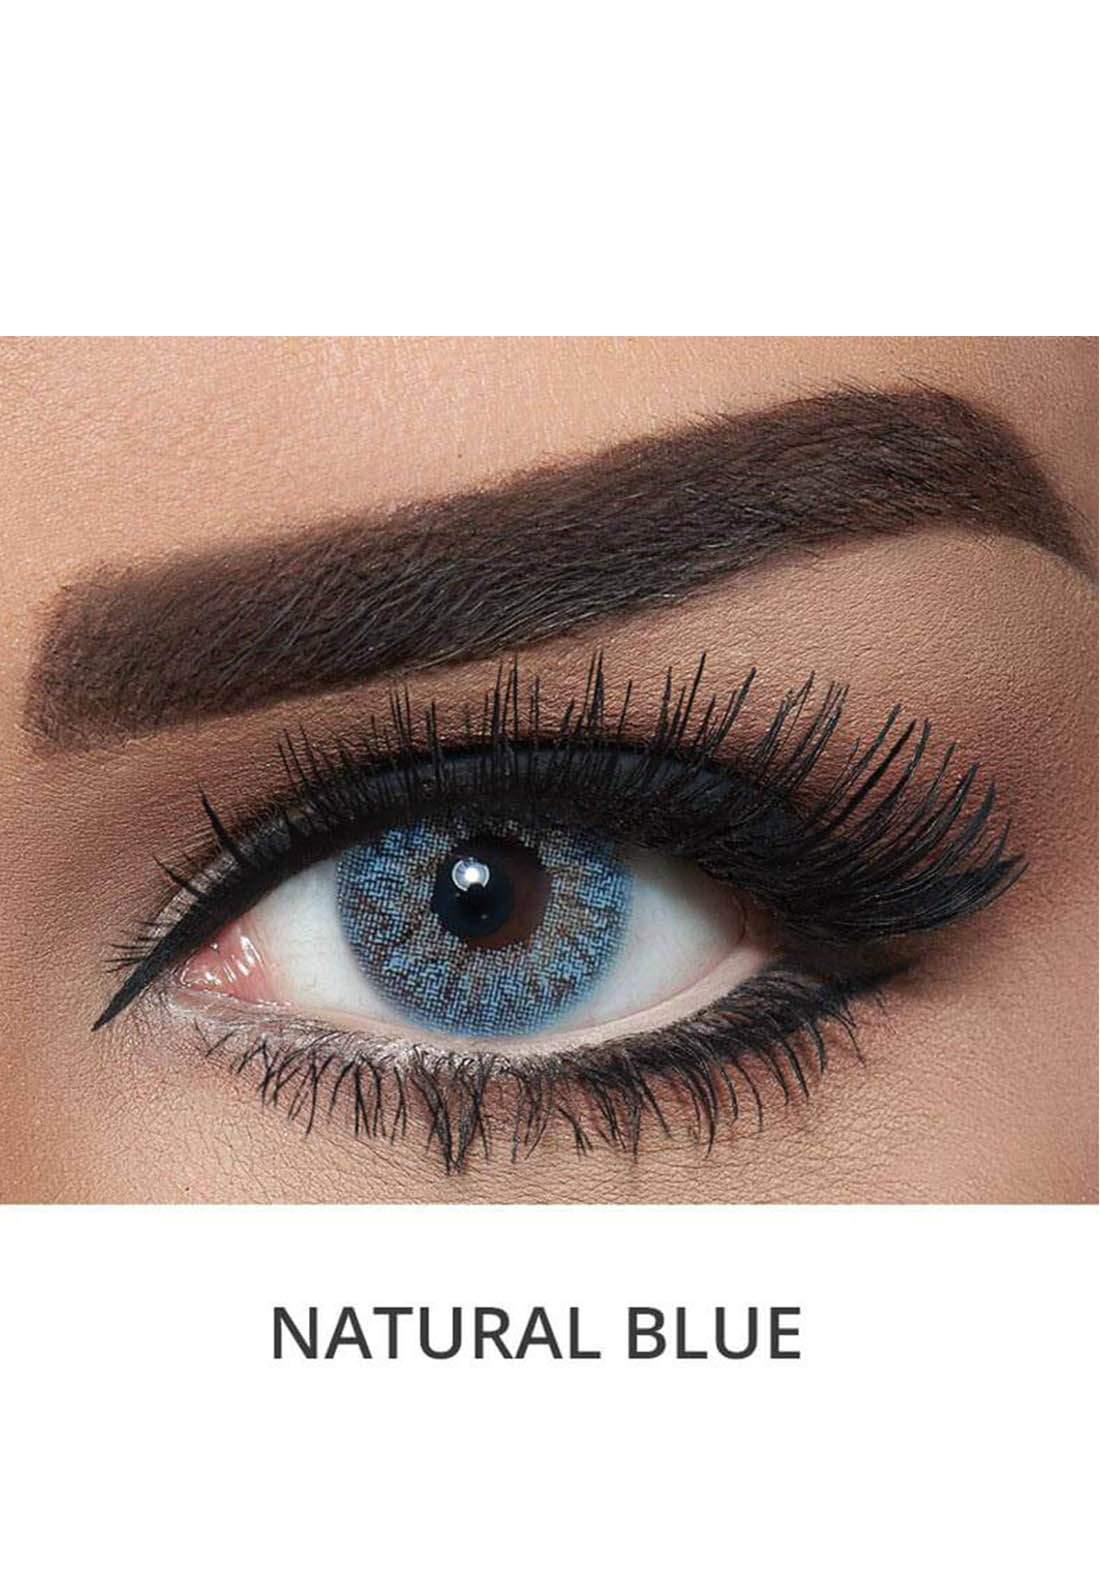 Bella Classic 301019 Contact Lenses 3 Months Use Natural - Blue No.21 عدسات لاصقة